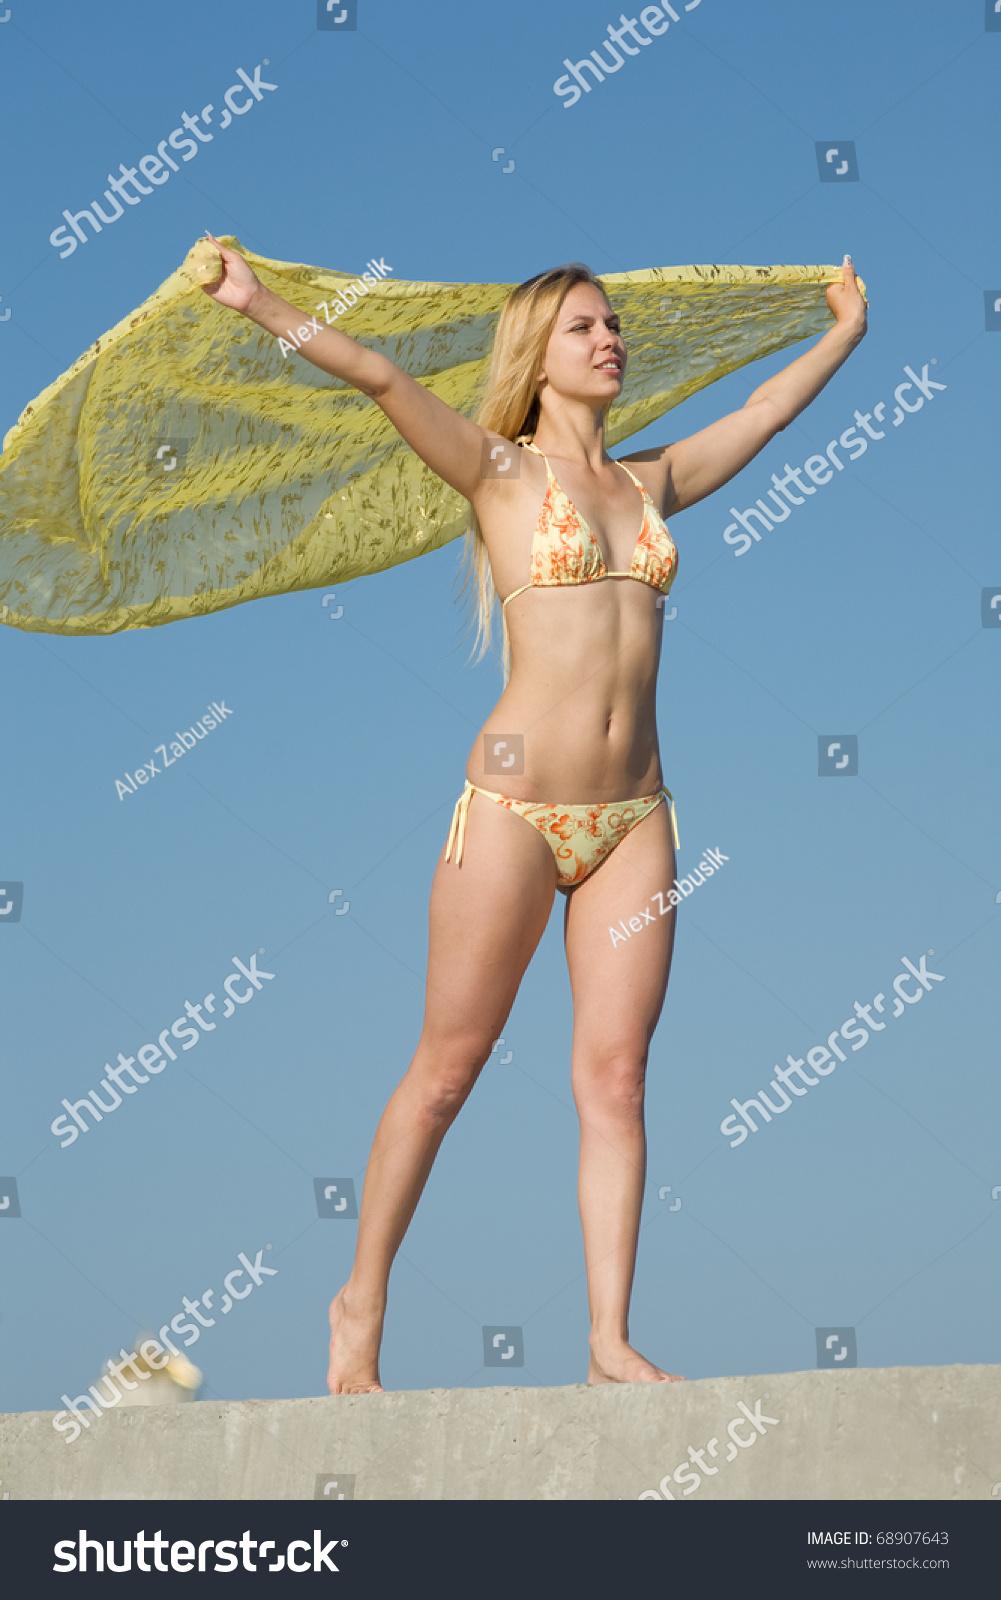 Bikini Loes Fielt nude (17 photo), Topless, Sideboobs, Instagram, in bikini 2020